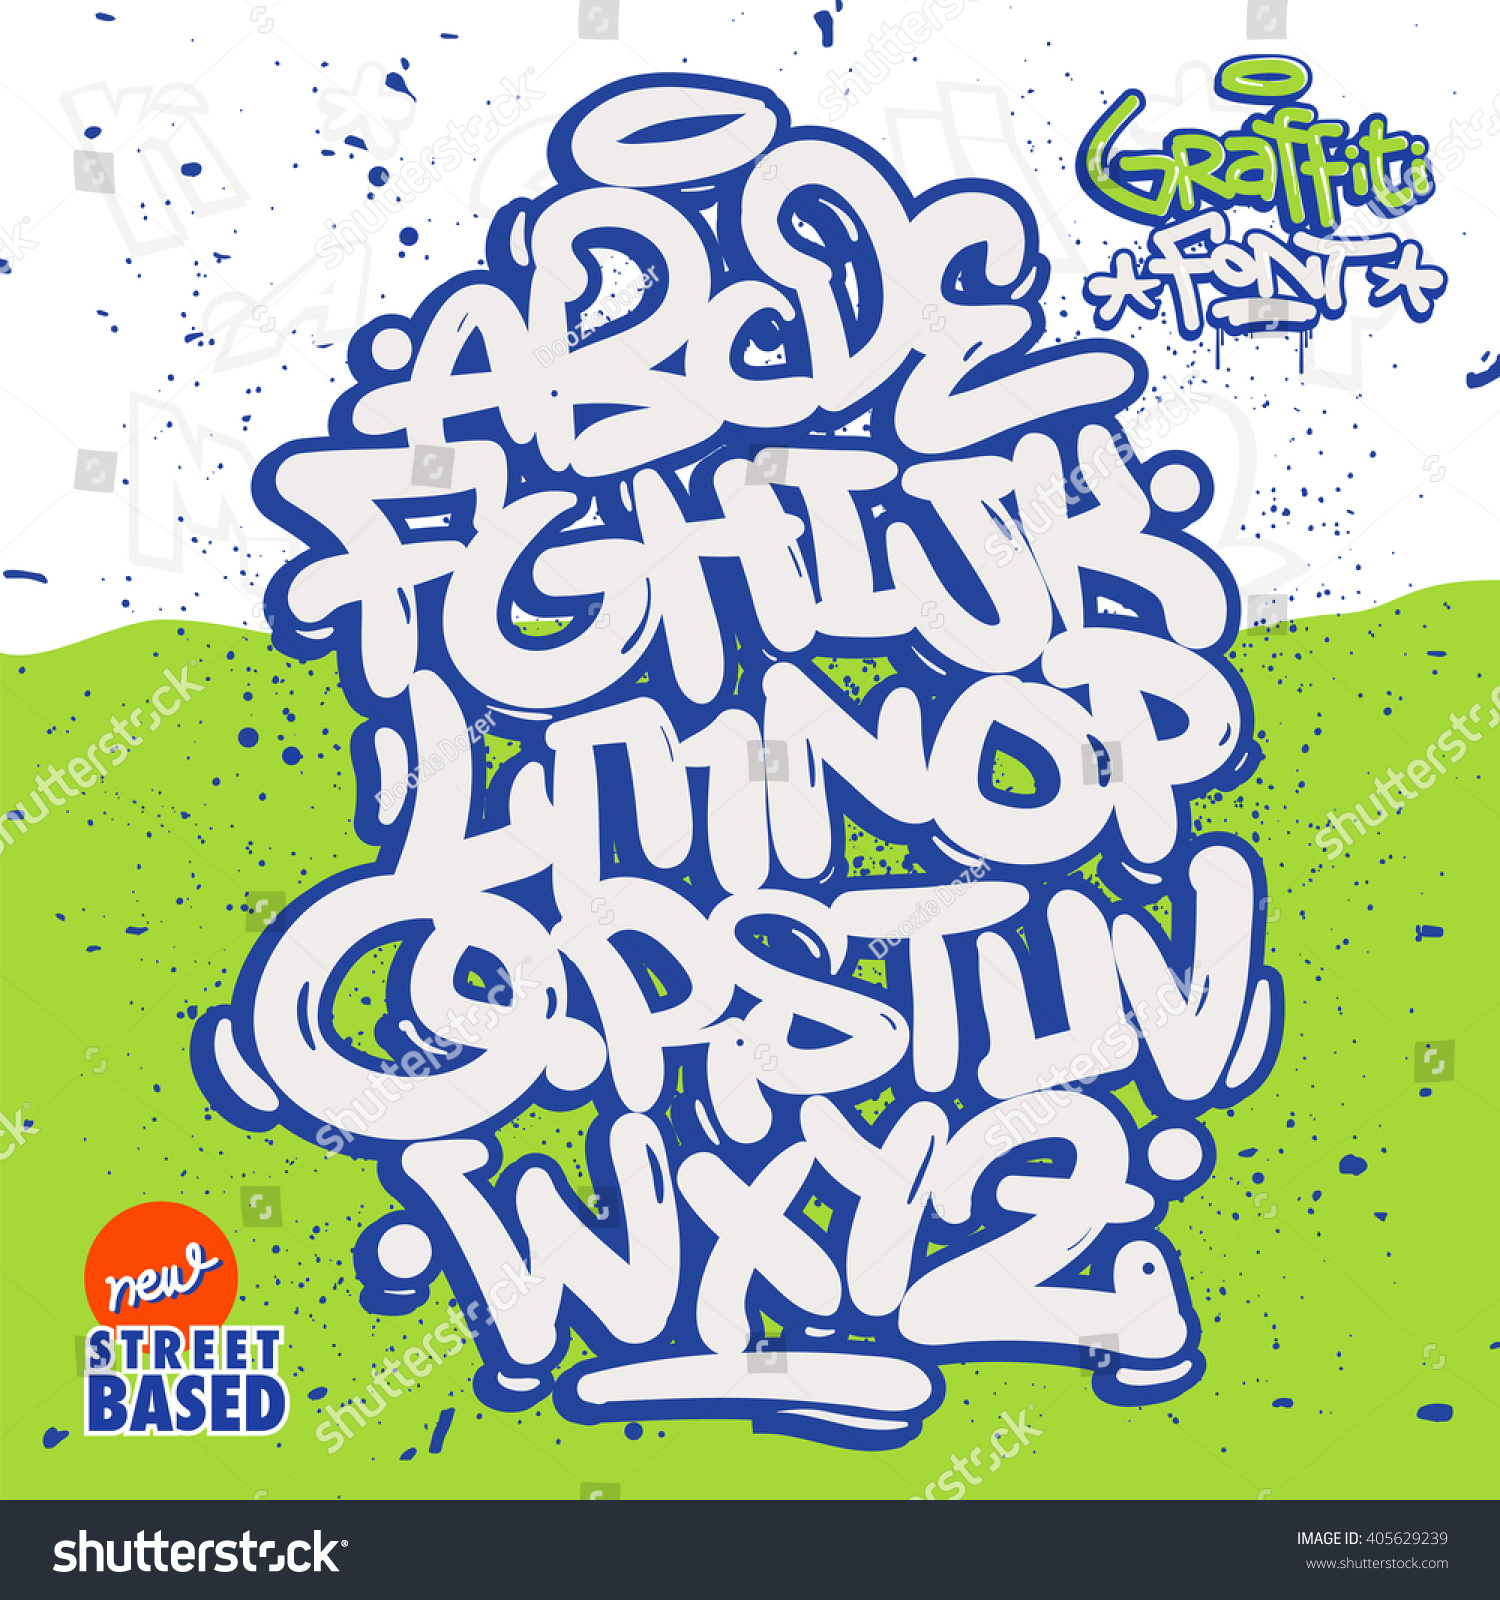 Bubble graffiti font family stock vector 405629239 - Bubble graffiti ...